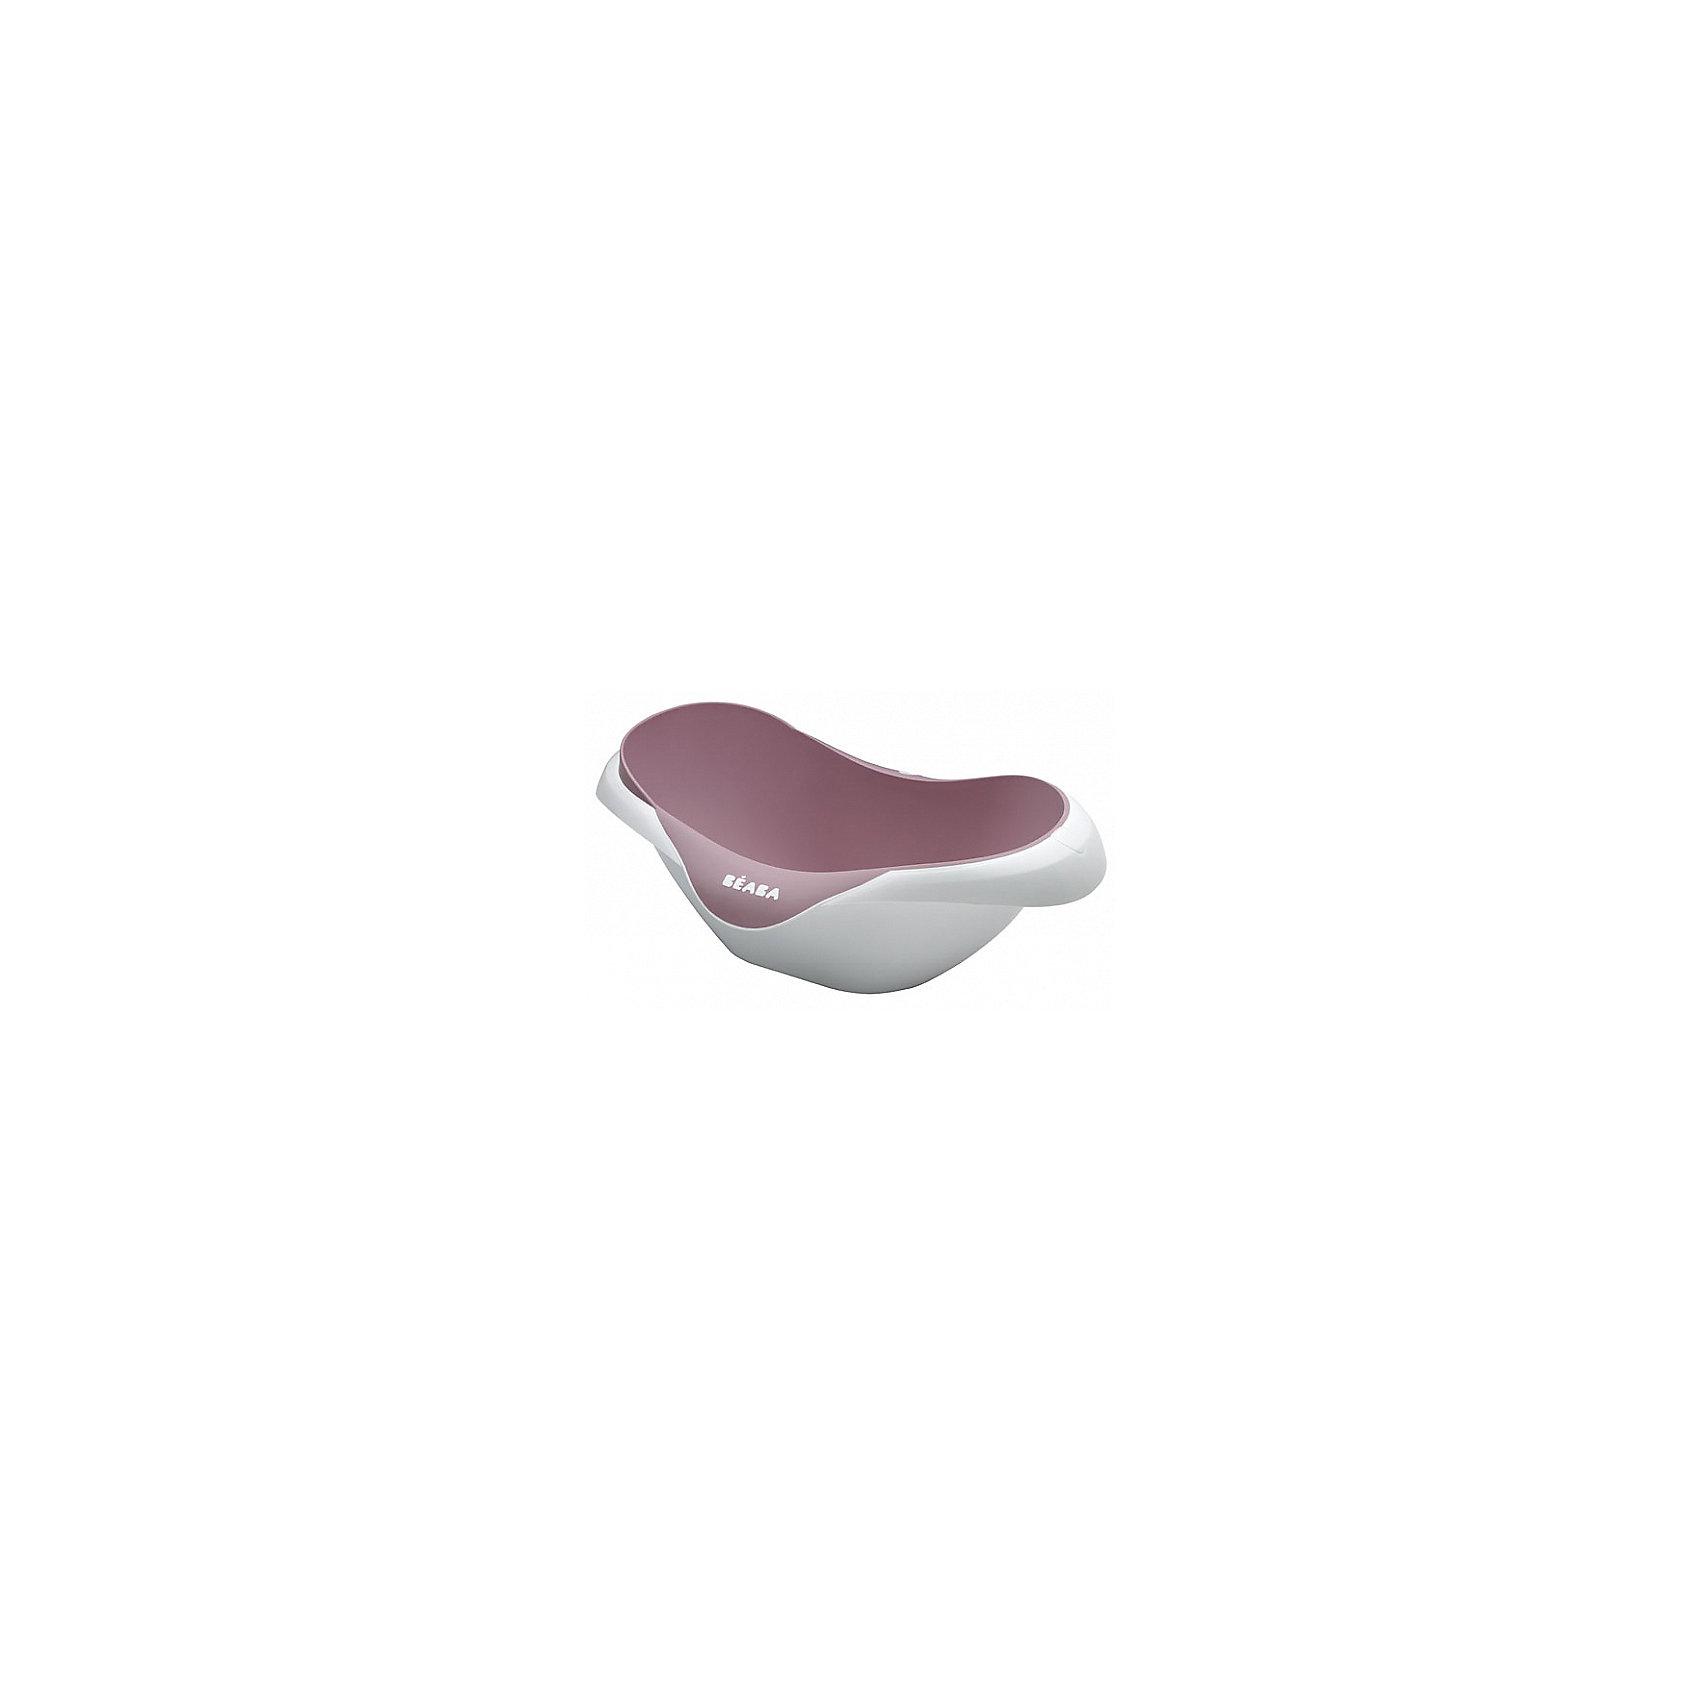 BÉABA Детская ванночка Camele'o Beaba, розовый béaba цифровой термометр beaba голубой